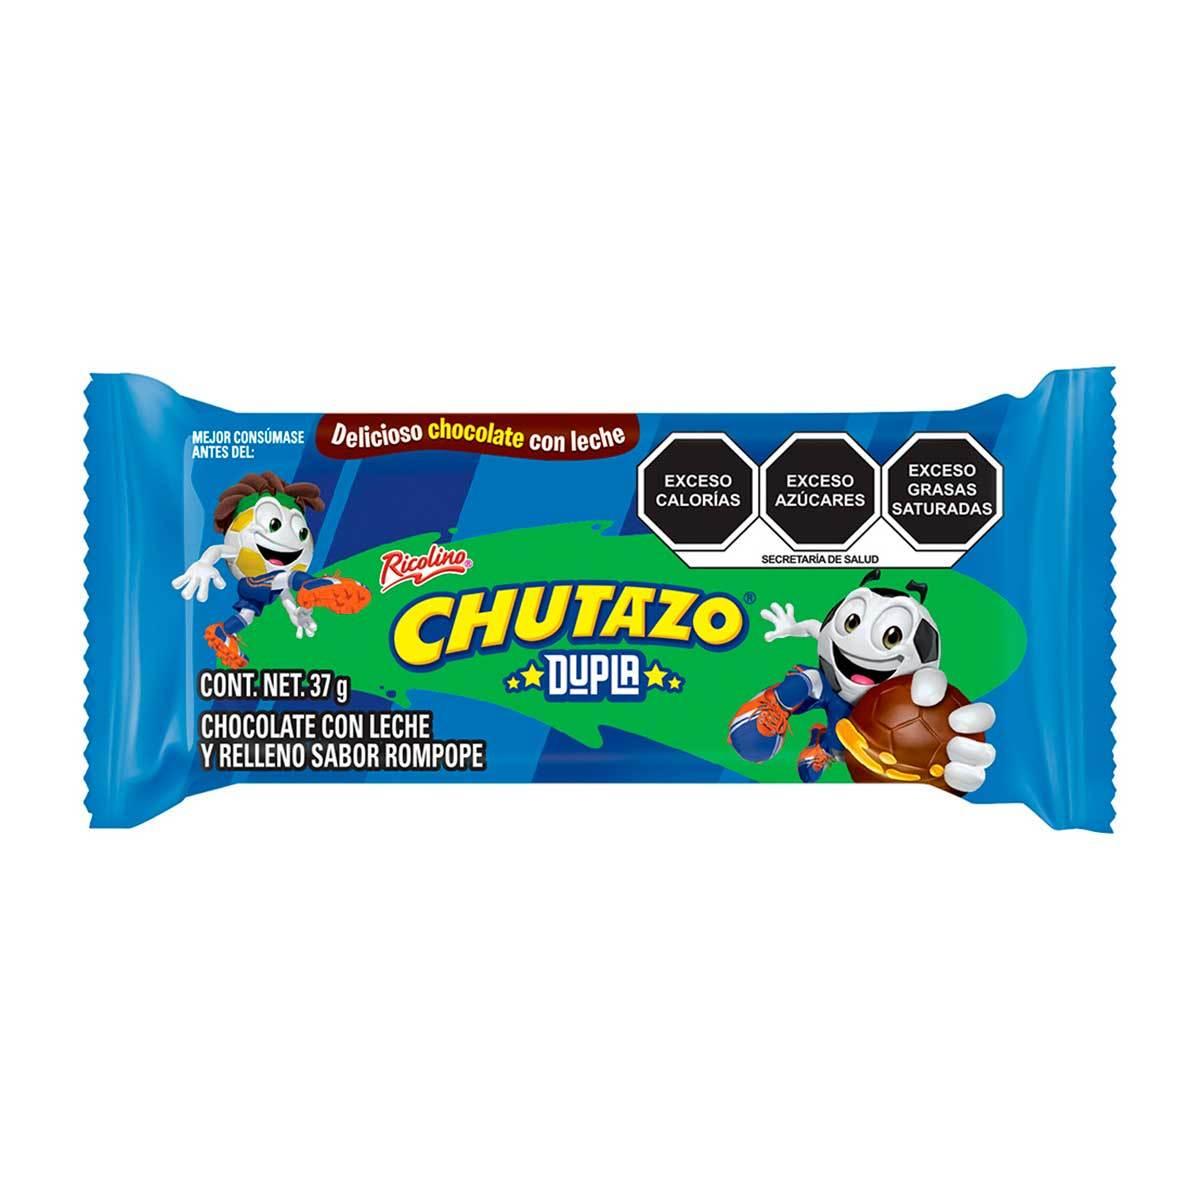 Chedraui Online Chocolate Ricolino Chutazo 2 Pack 37g